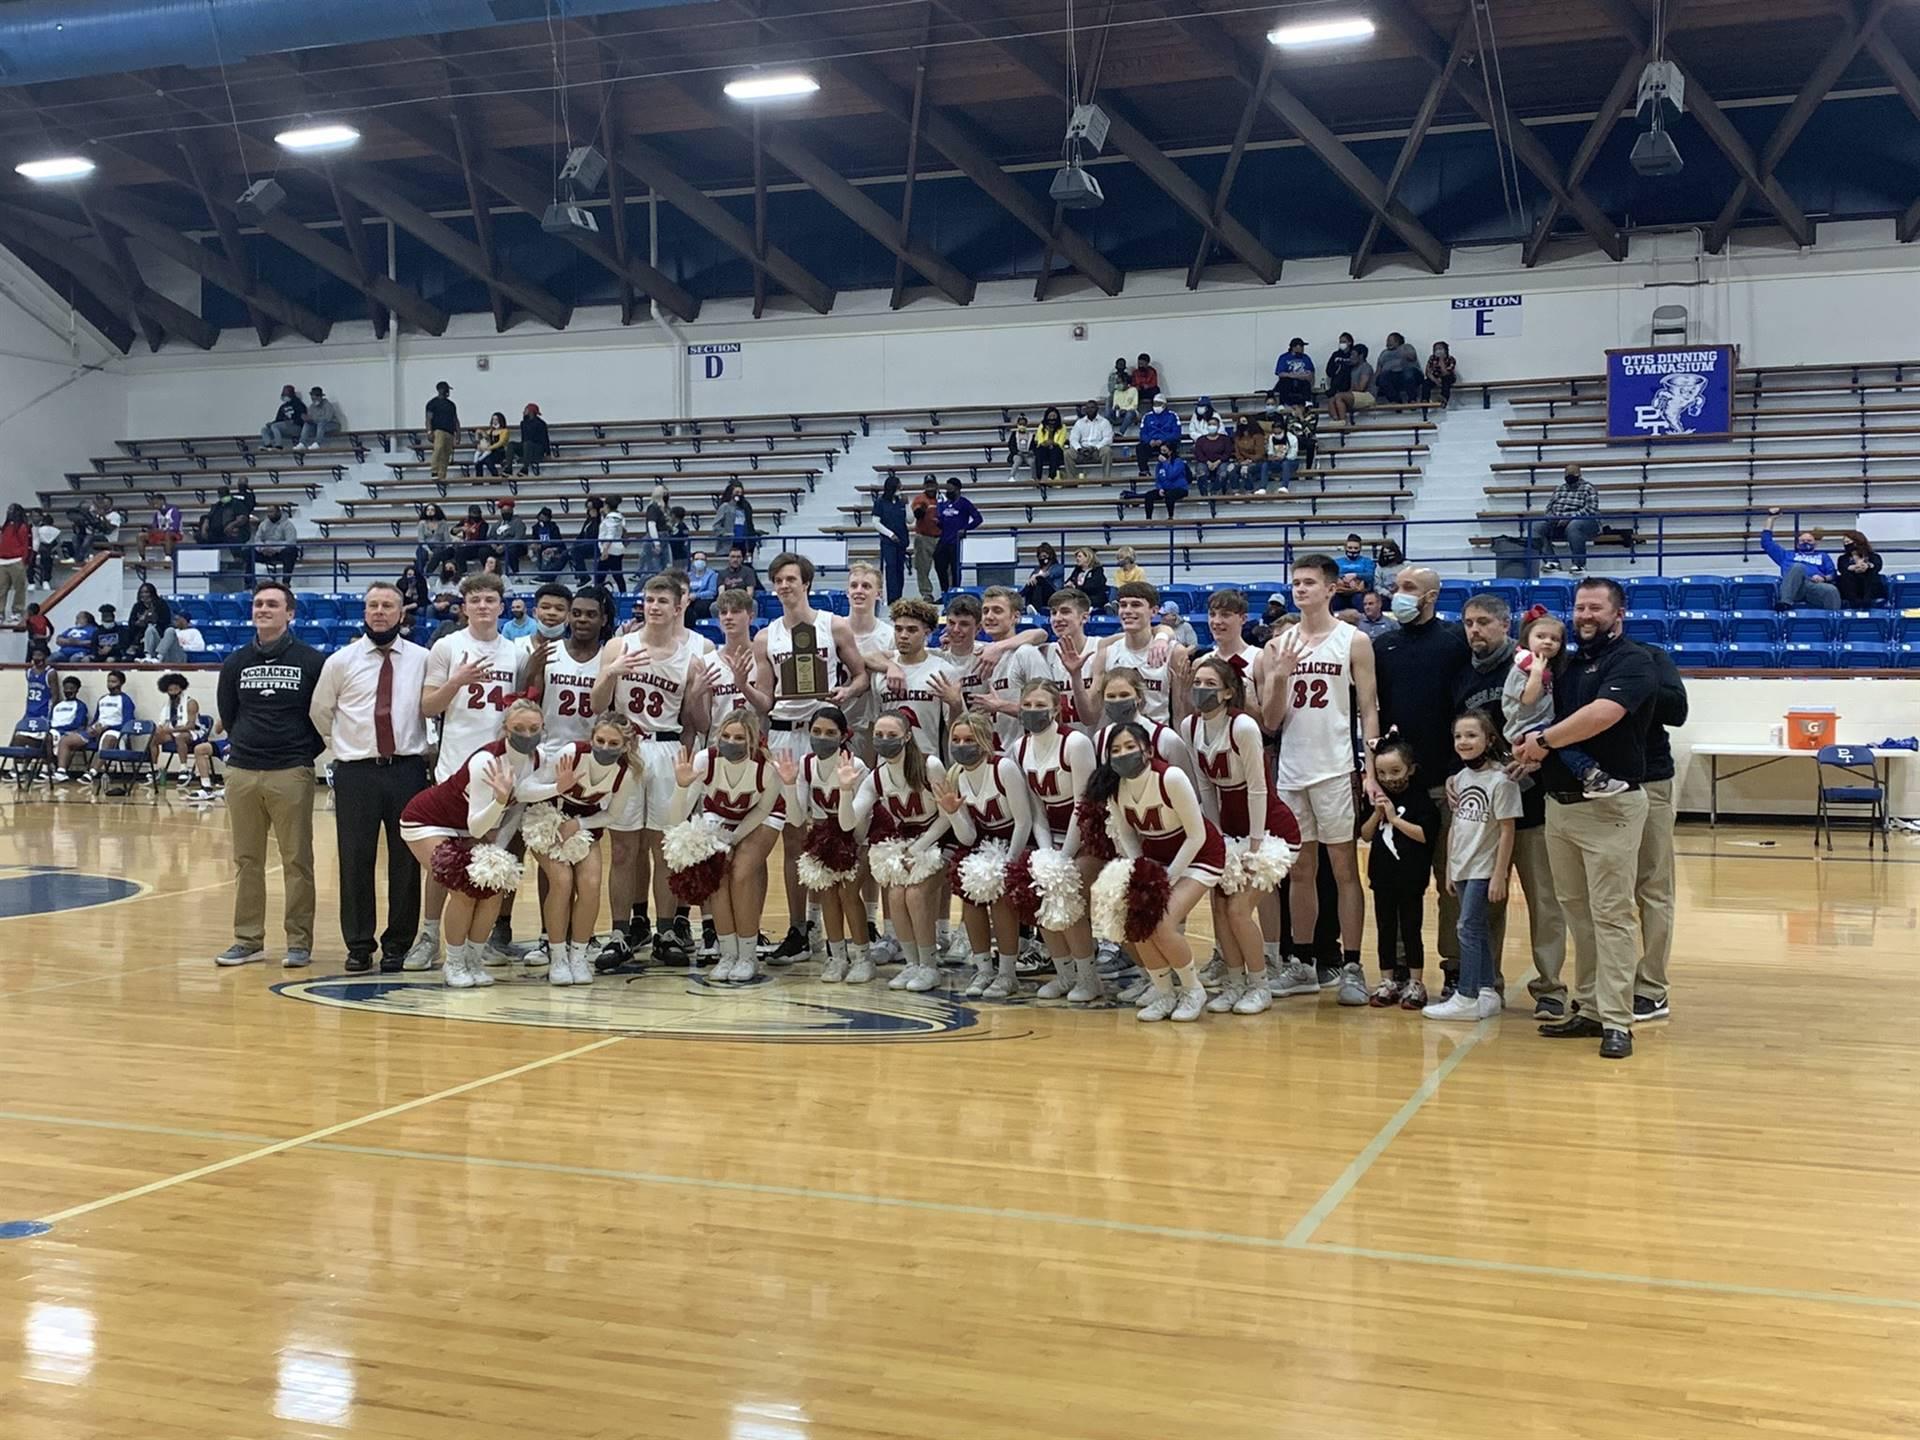 Mustangs Men's Basketball - 2021 District Champions!